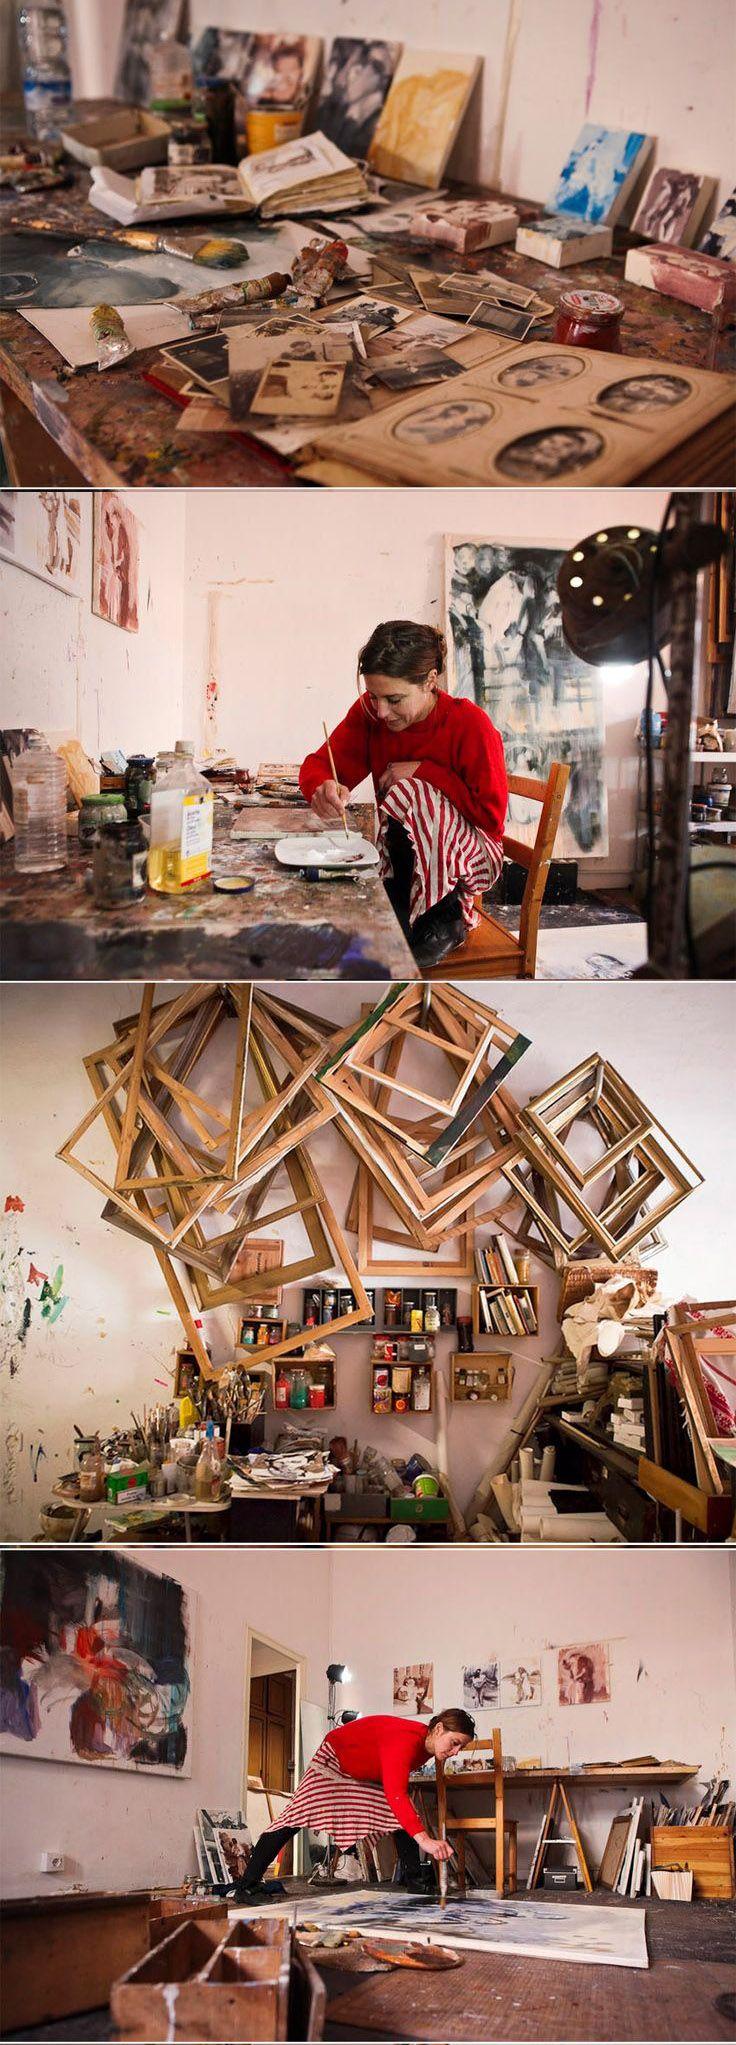 Anna McNeil   http://magazine.saatchiart.com/articles/artnews/saatchi-art-news/inside-the-studio-saatchi-art-news/anna-mcneil